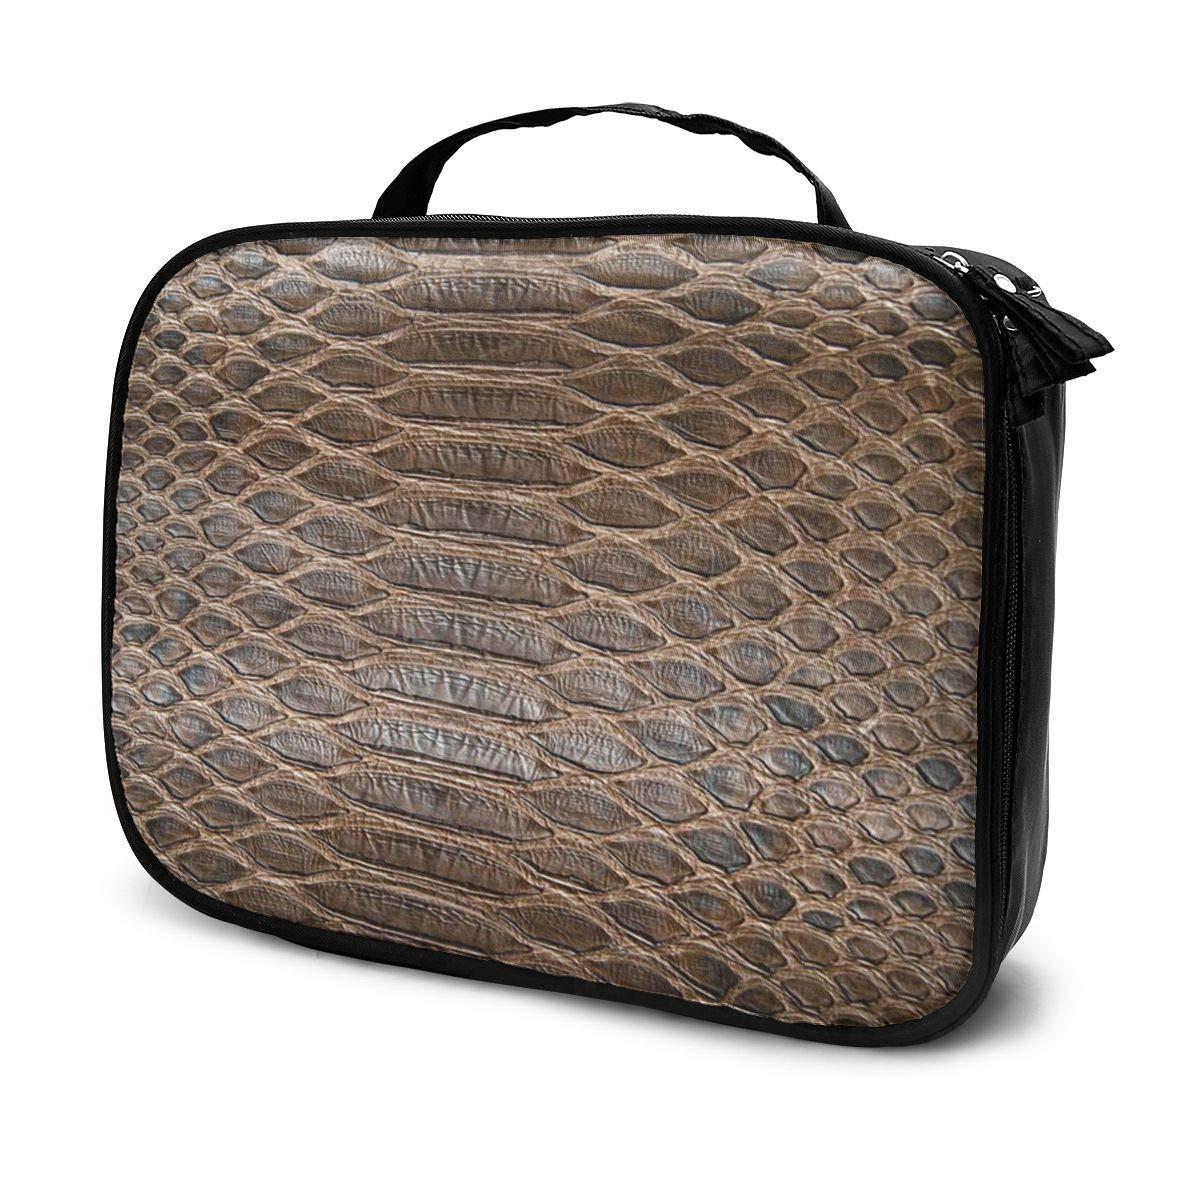 SZshenya Waterproof Cosmetic Bag With Handle, Portable Travel Cosmetics Bag For Women Alligator Black Skin Brown Crocodile Snake Serpent Snakeskin Abstract